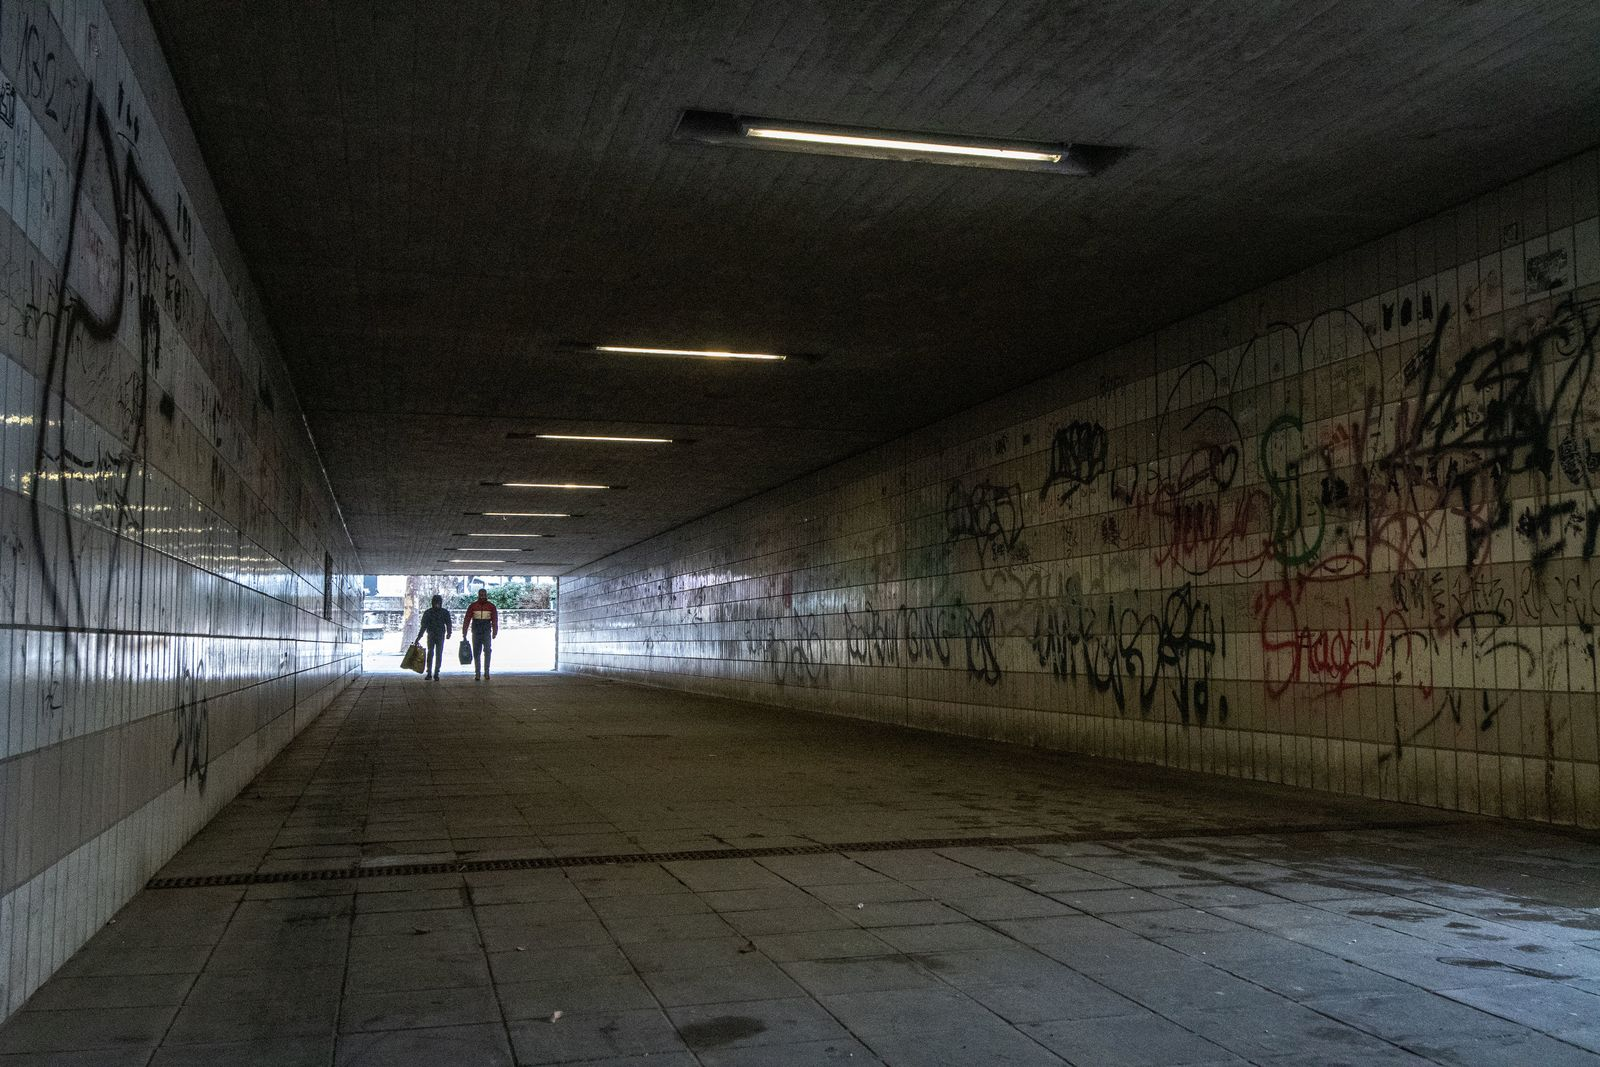 Amberg Bahnhof Passerelle